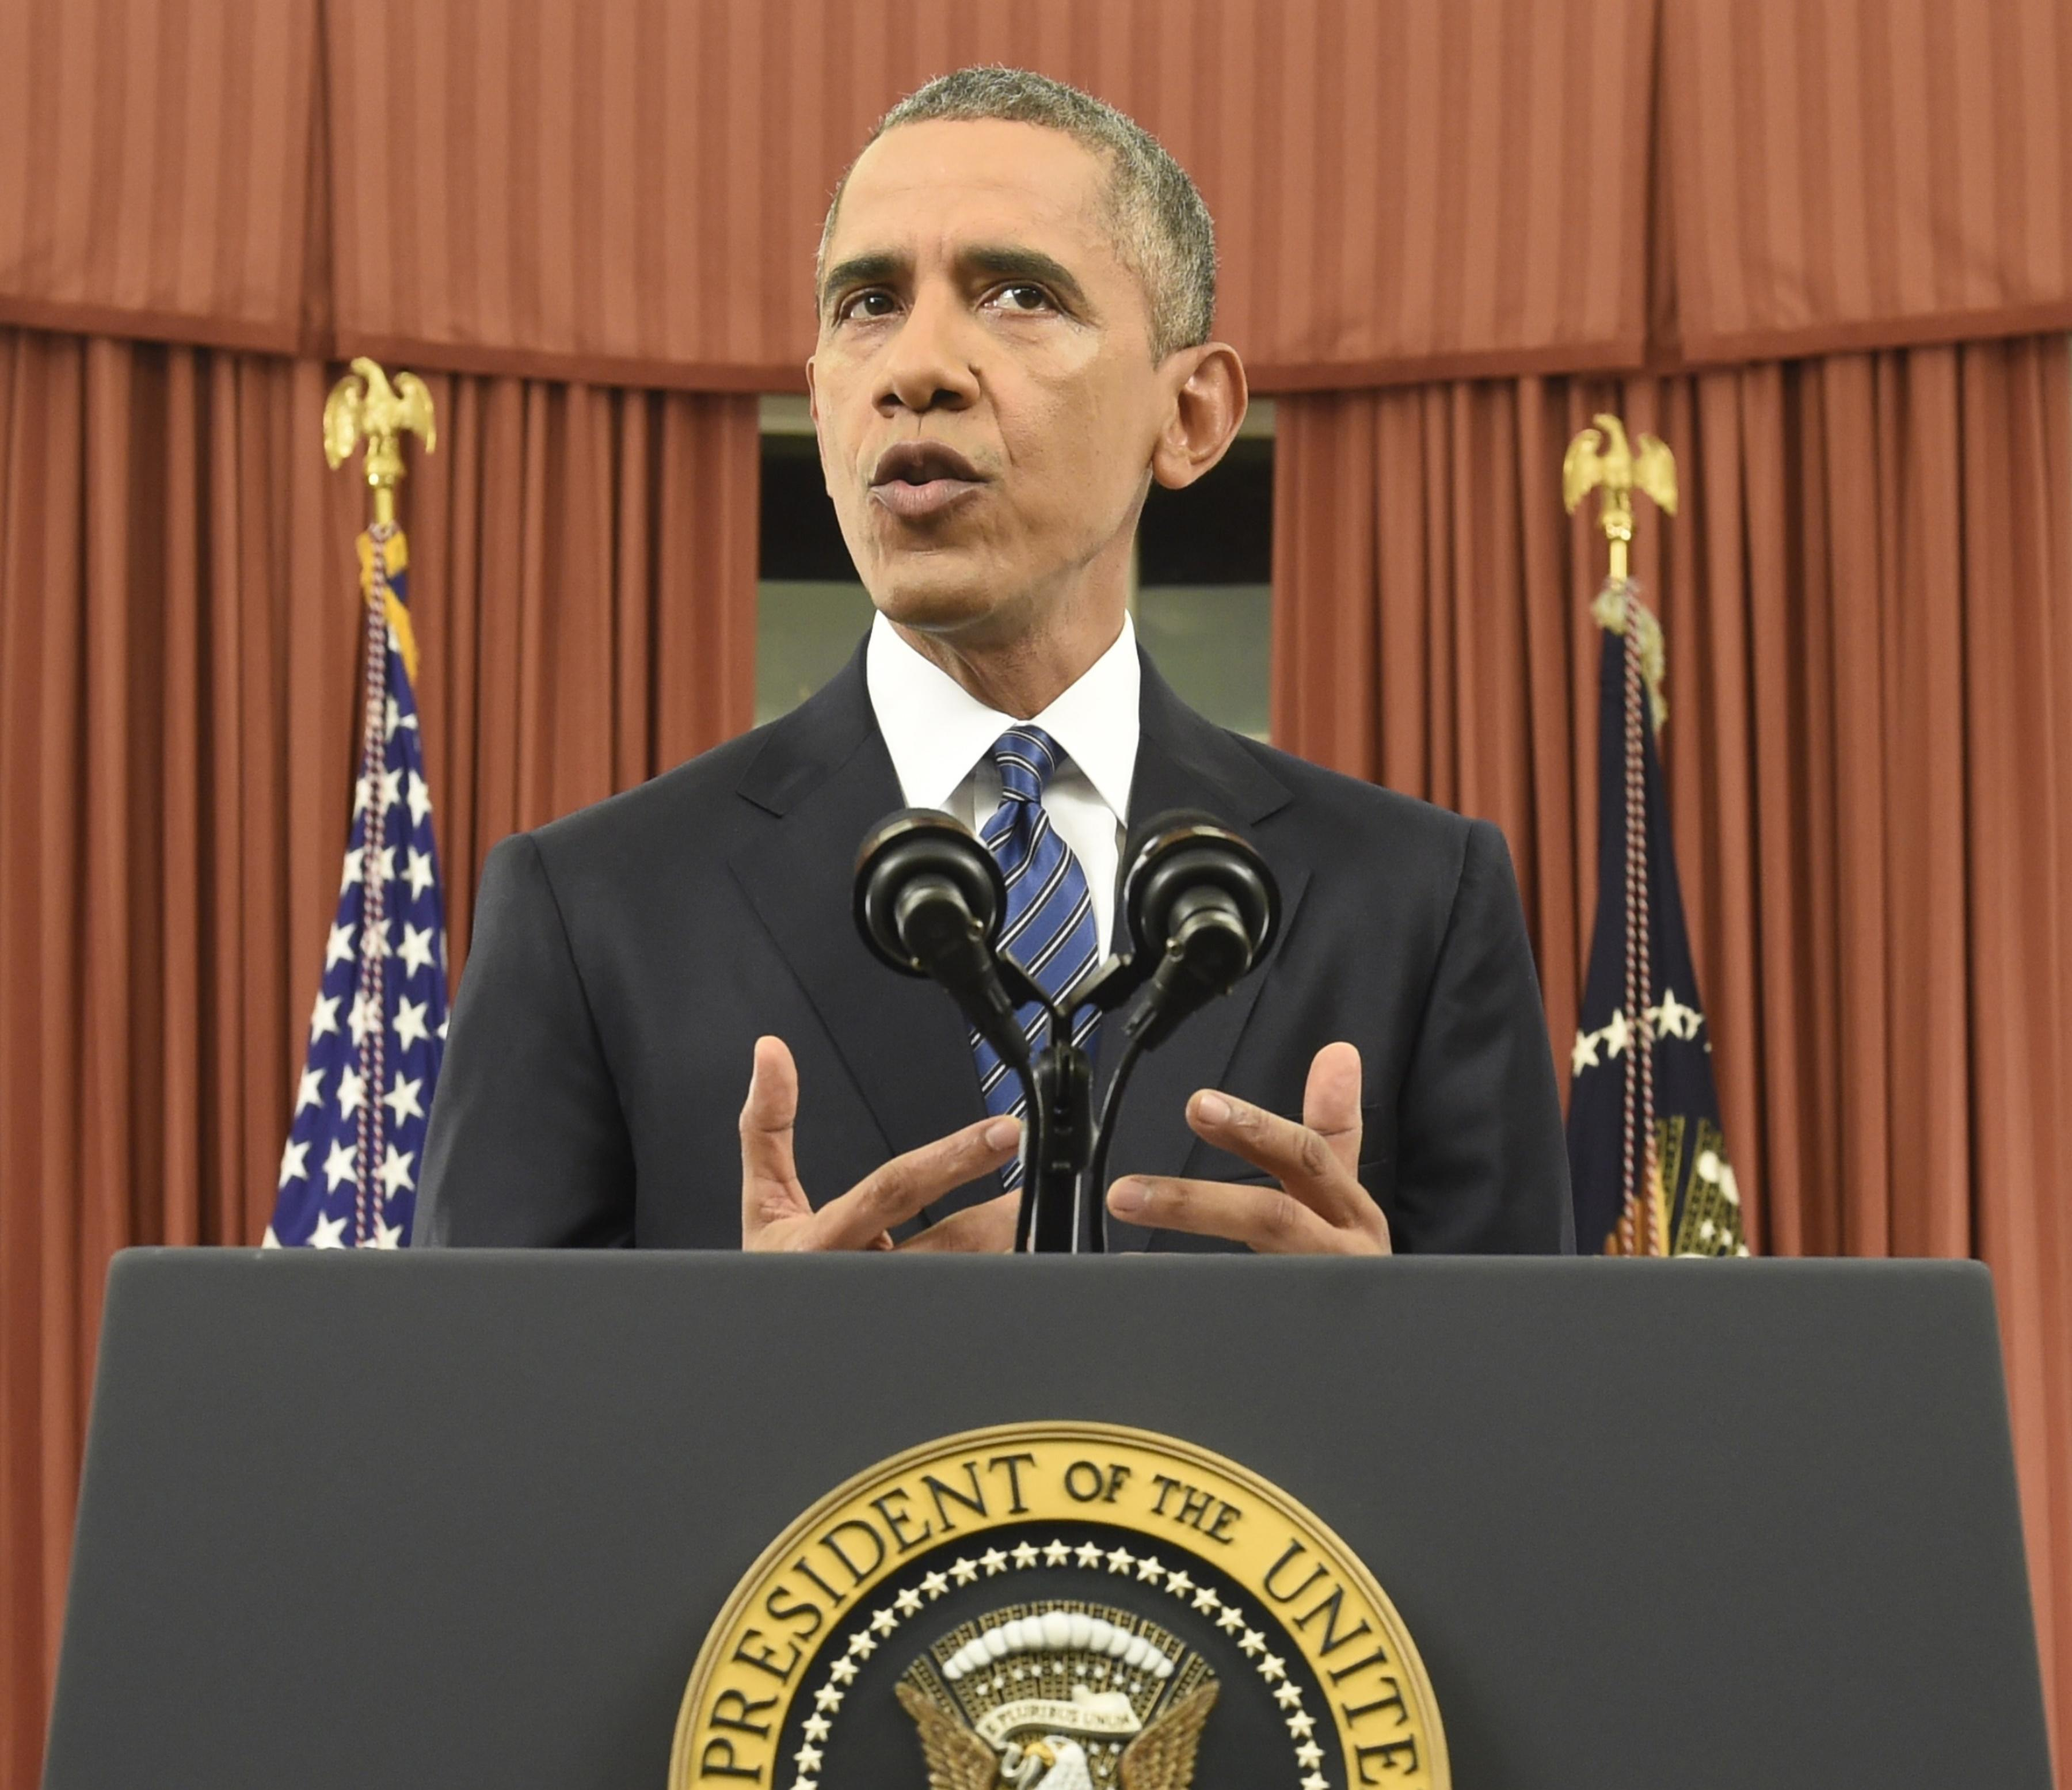 Obama speech criticized as weak; terrorism war strategy changes ...